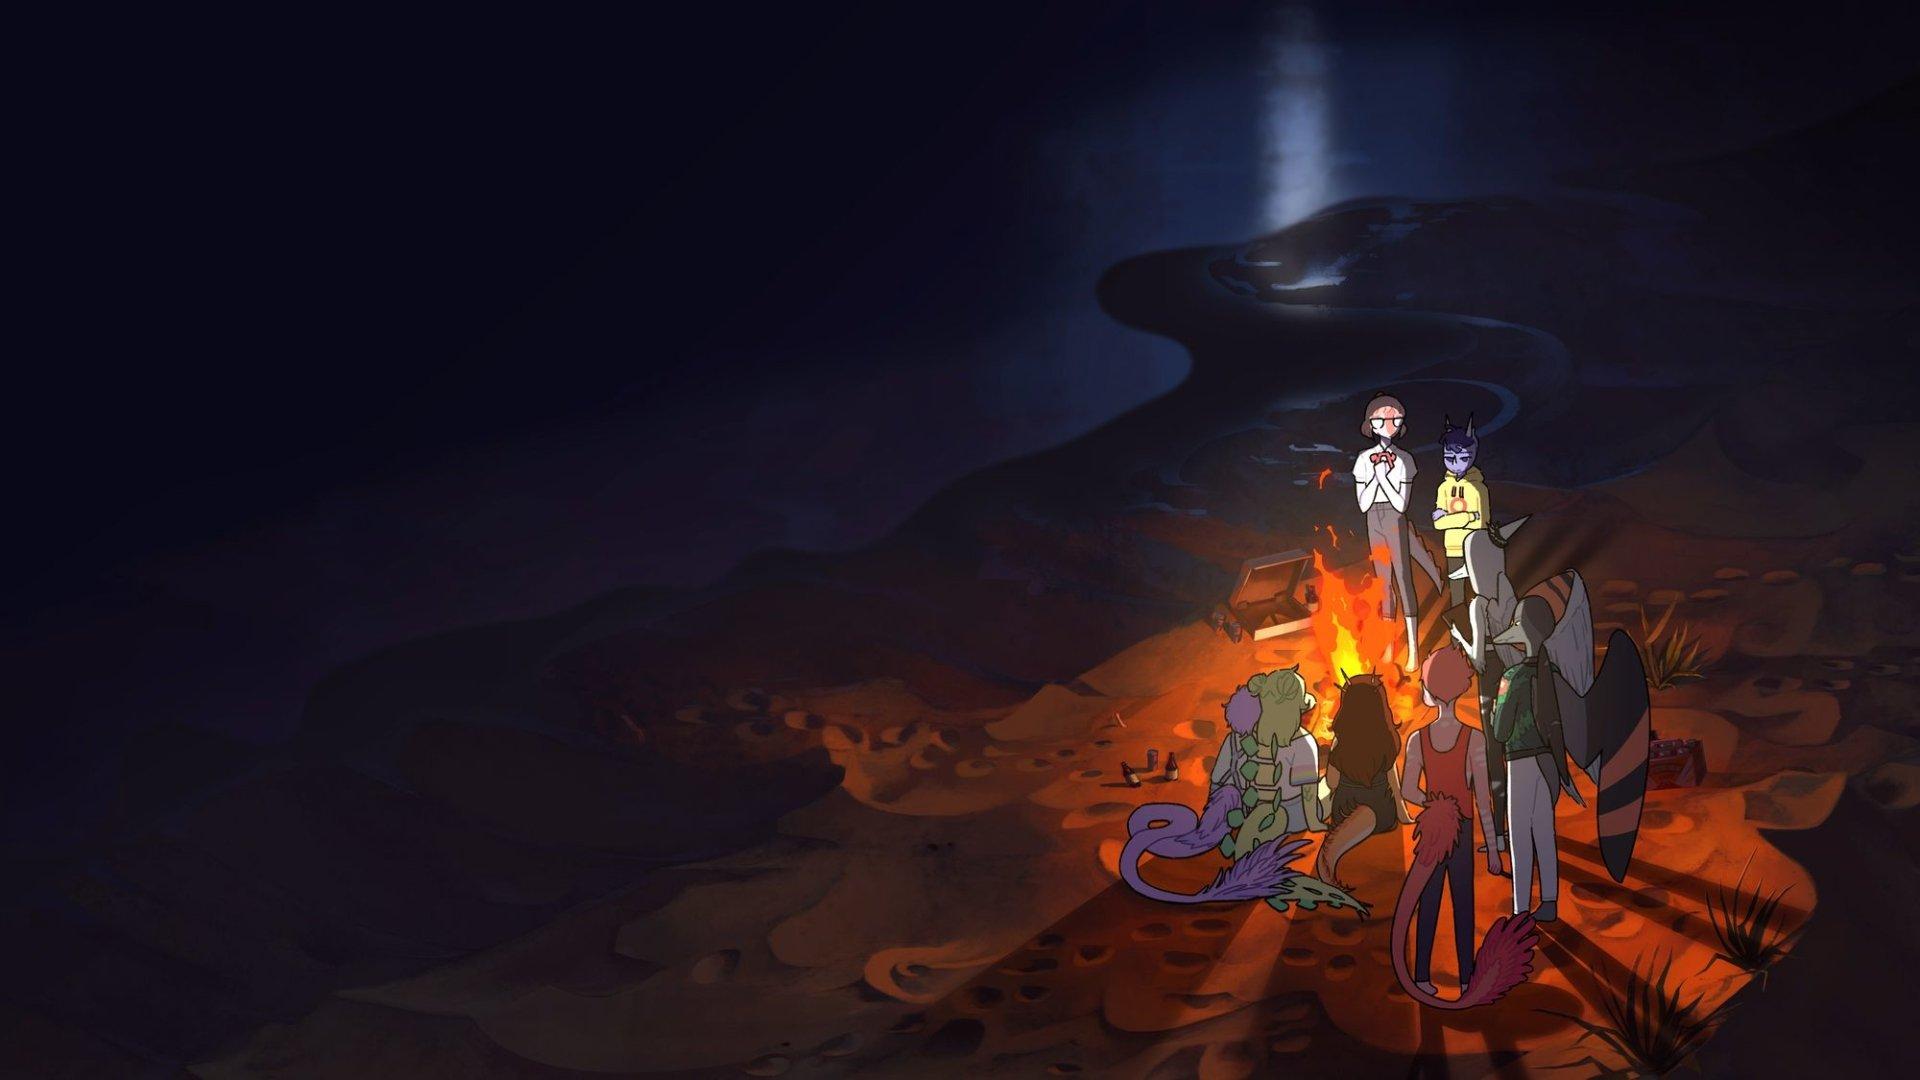 goodbye volcano high ps5 video game hd wallpaper 2366